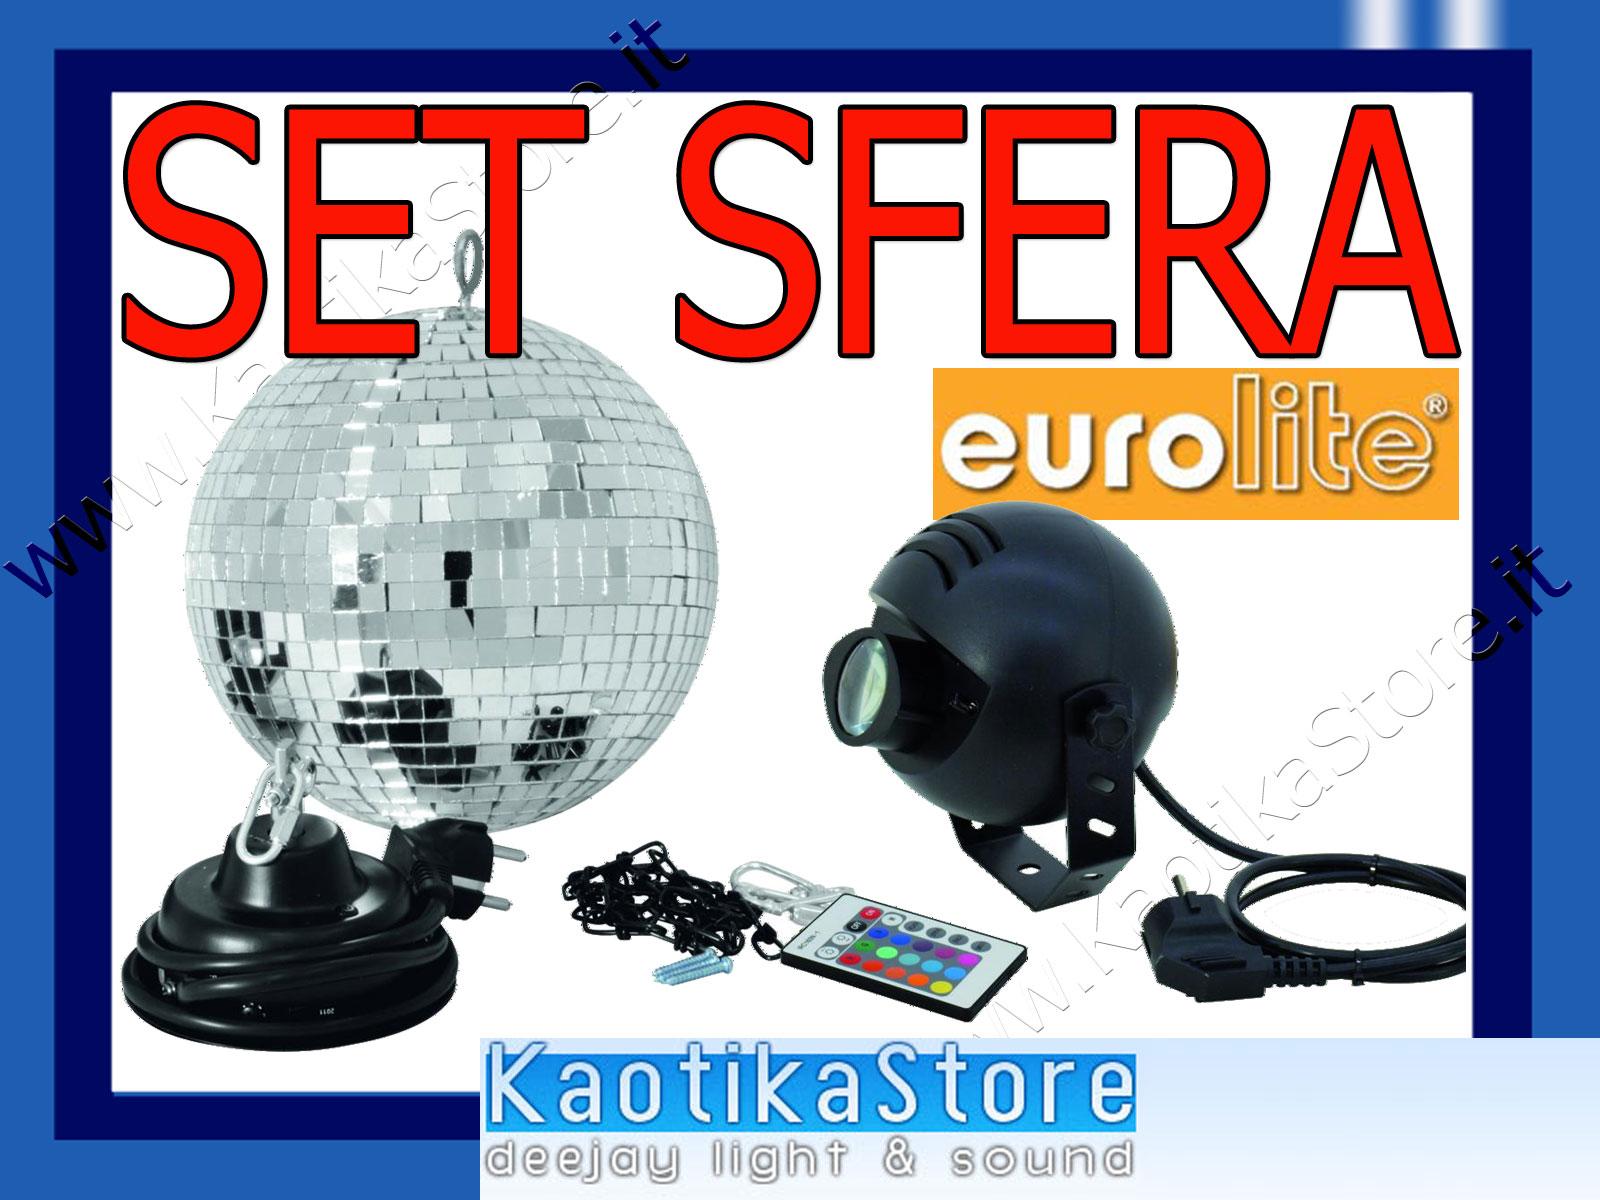 Set sfera specchiata 20cm motore faretto led rgb effetto specchi kaotikastore ebay - Specchi riflessi karaoke ...